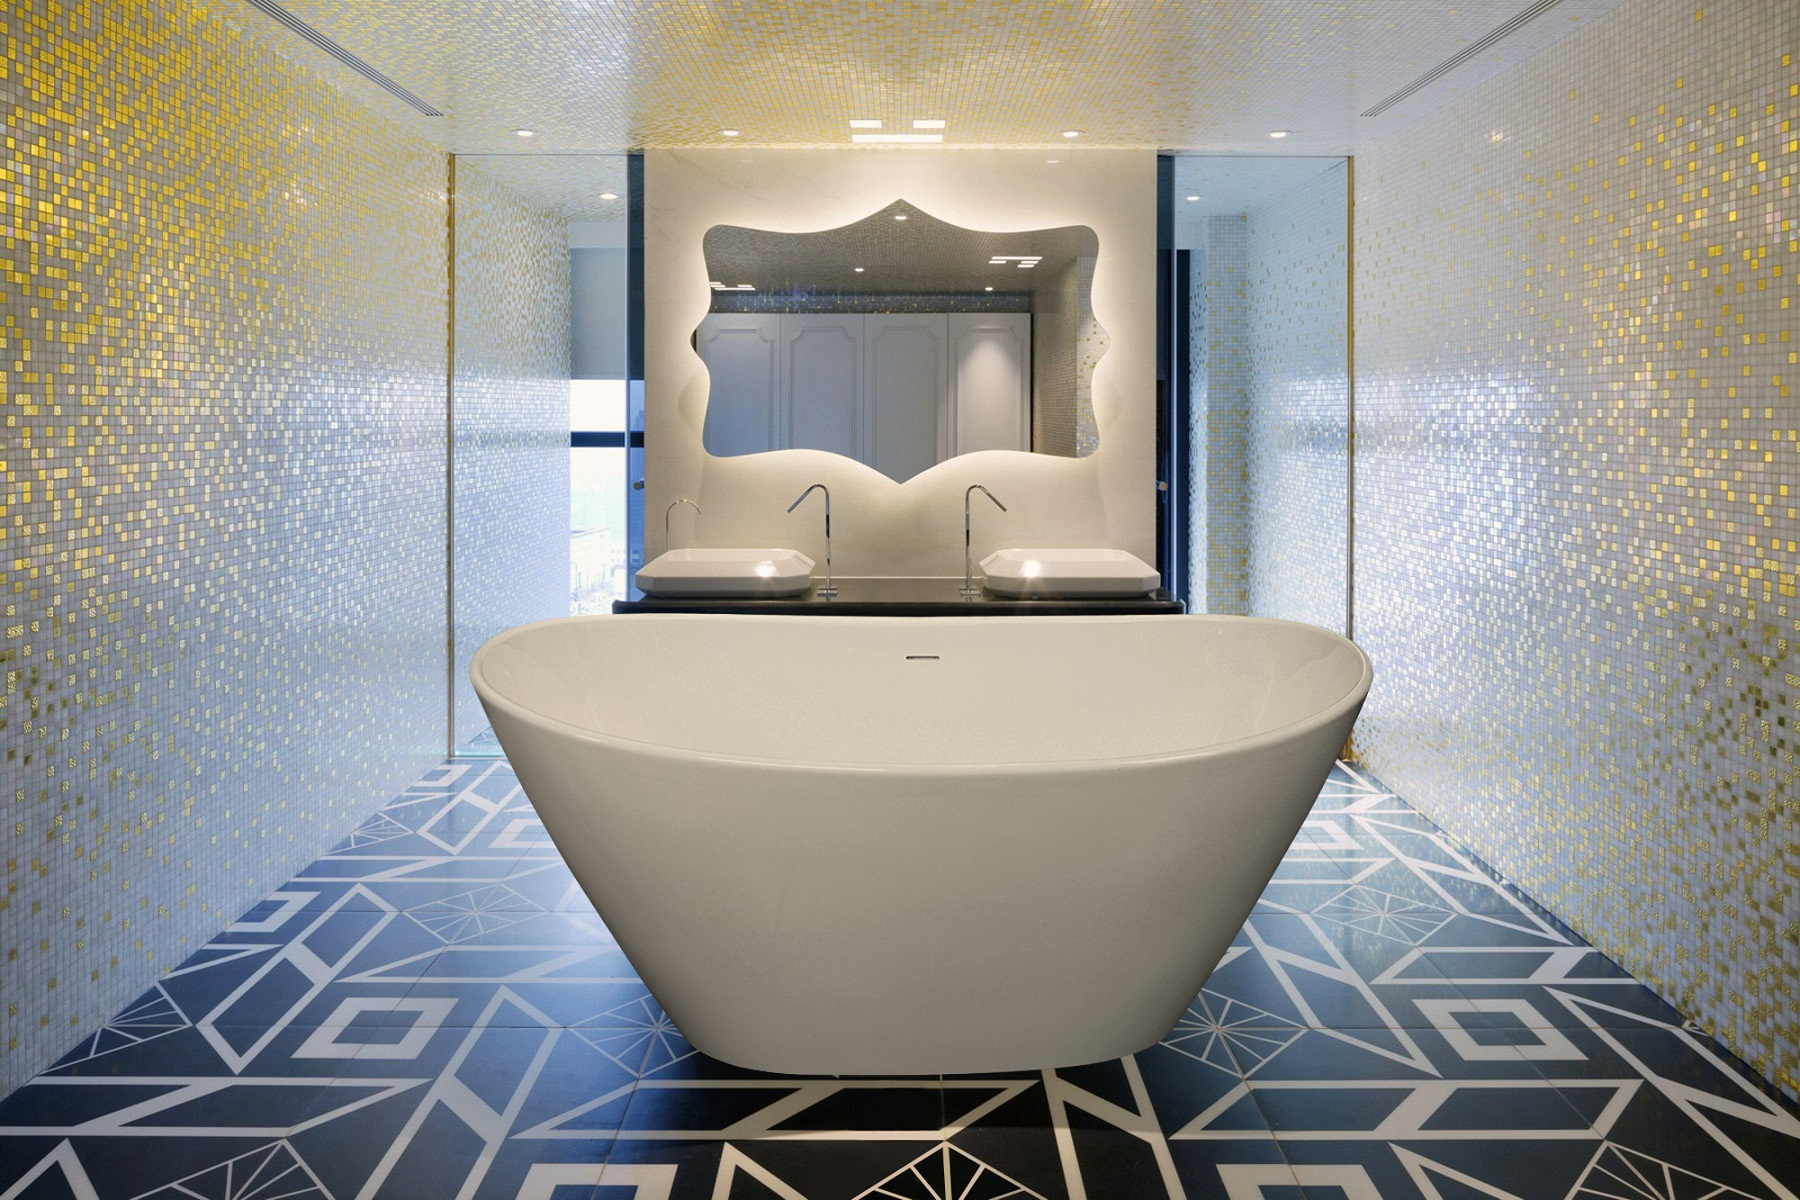 How To Choose Bathtub Size